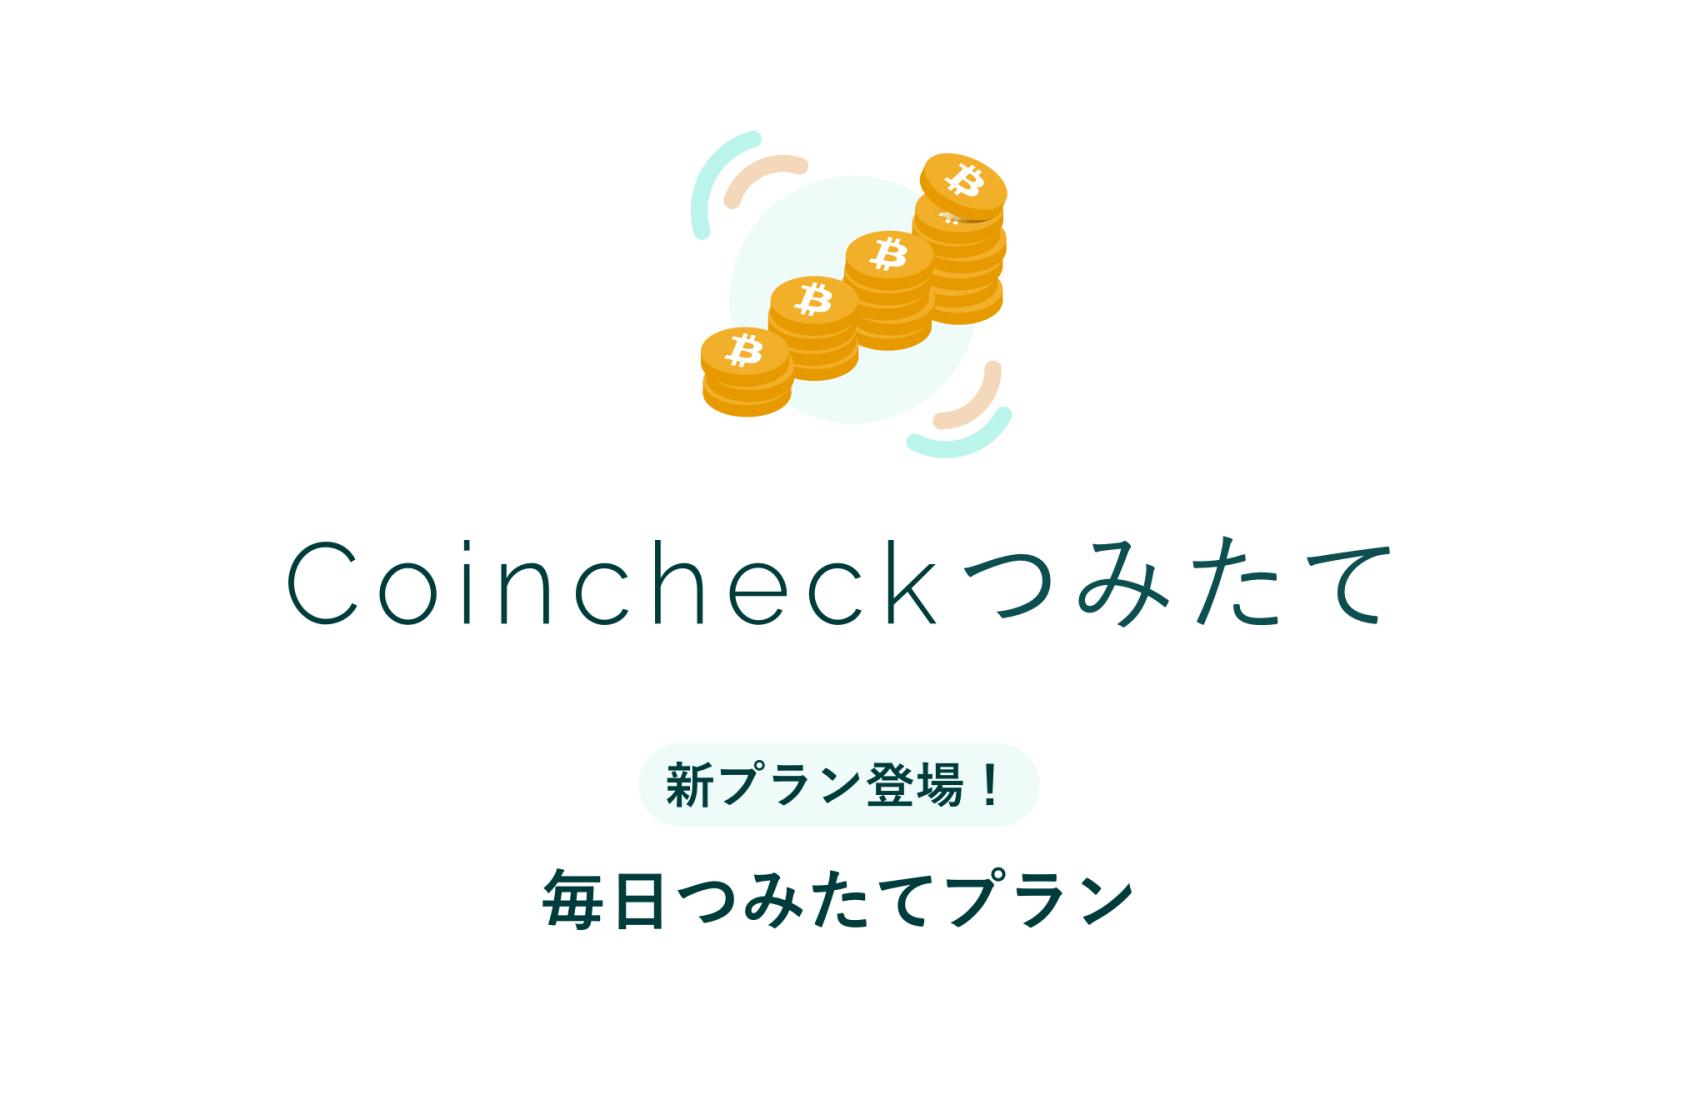 「Coincheck」つみたて、新プラン「毎日つみたてプラン」の提供を開始